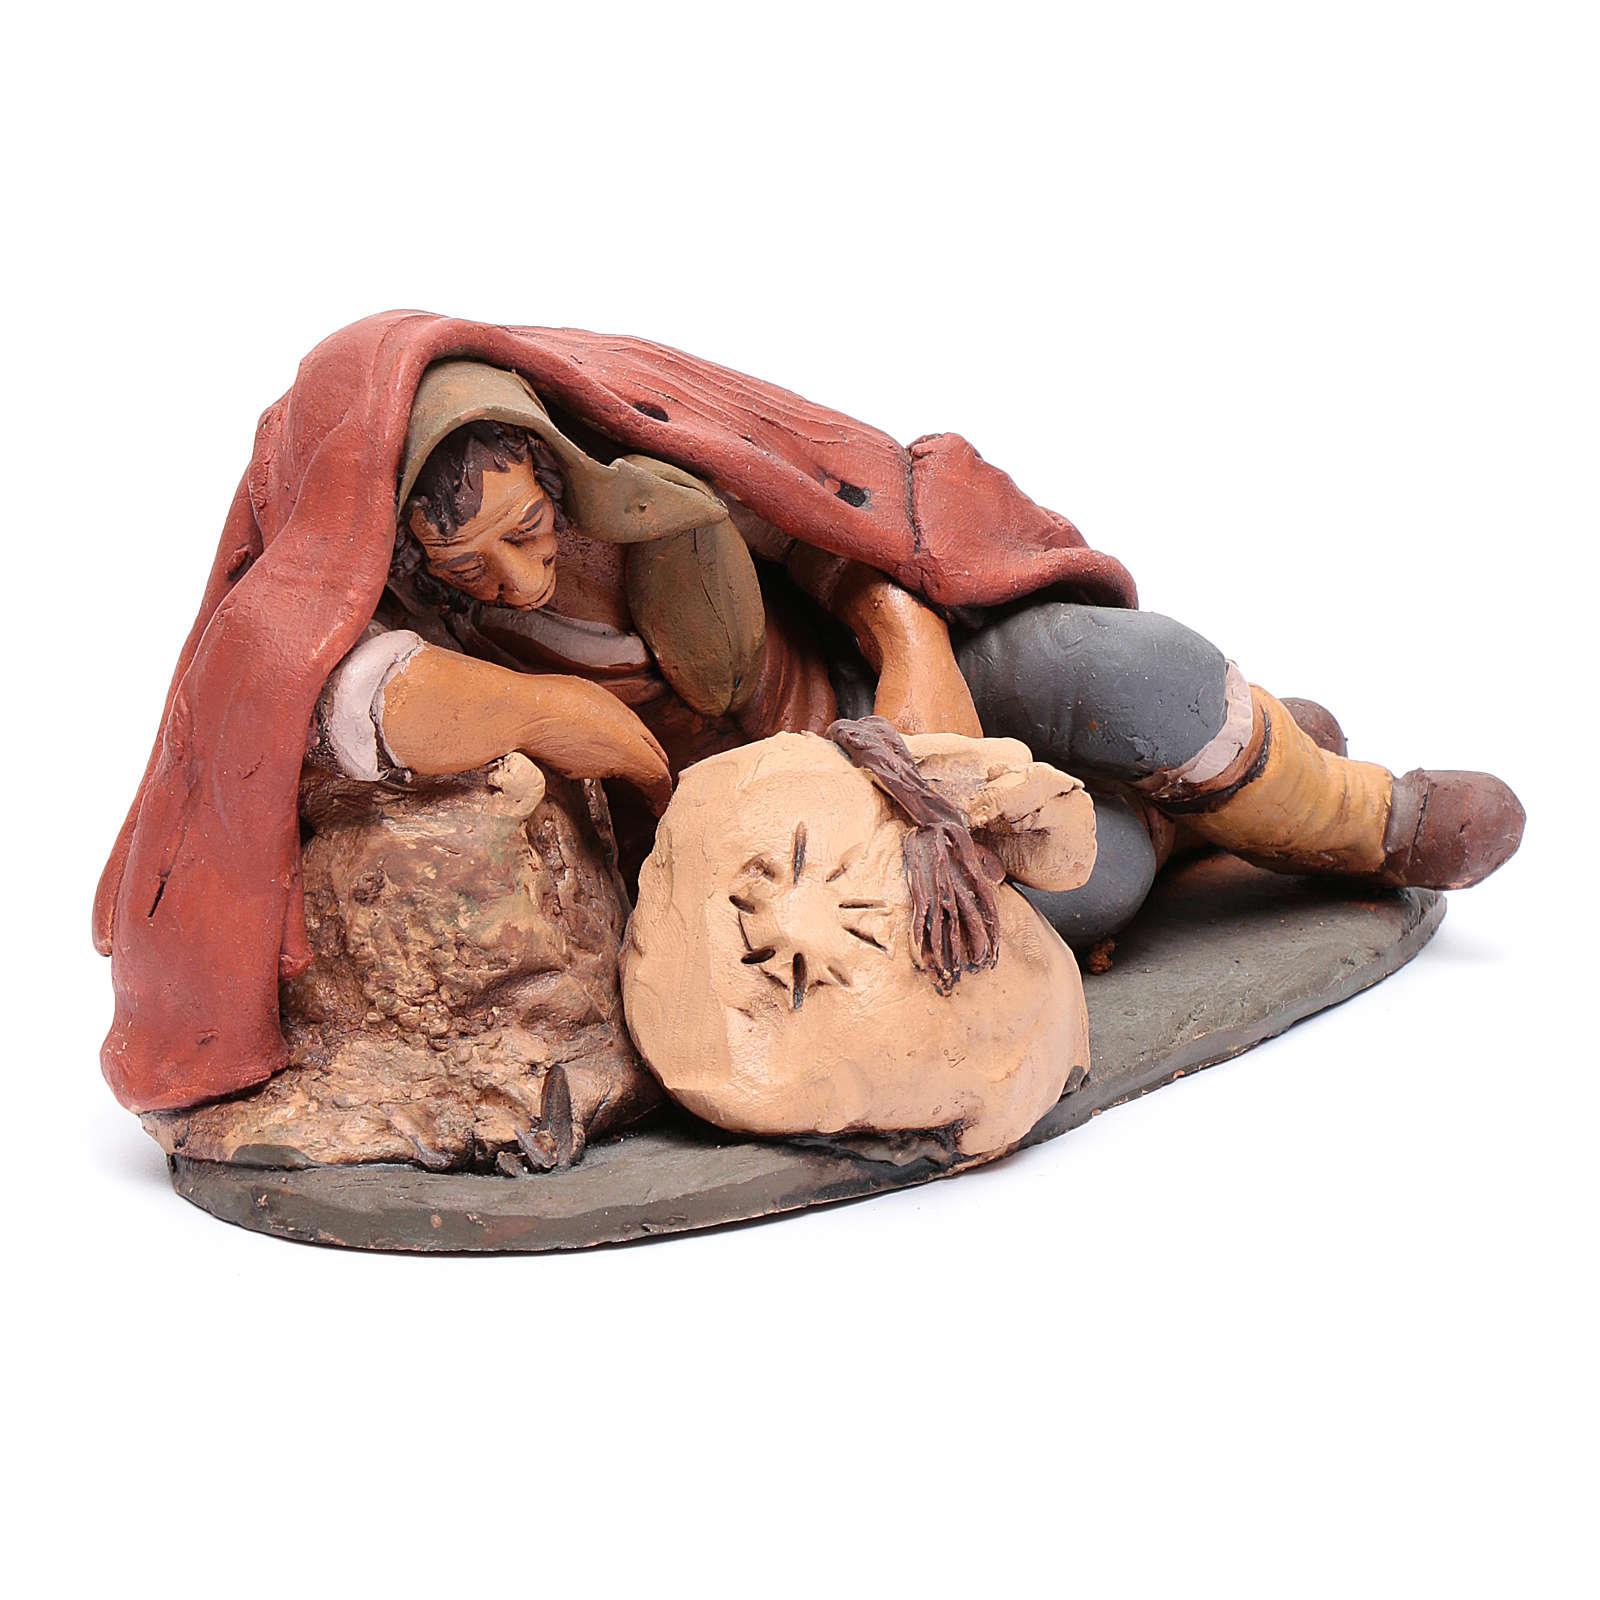 Dormiente 30 cm in terracotta di Deruta 4